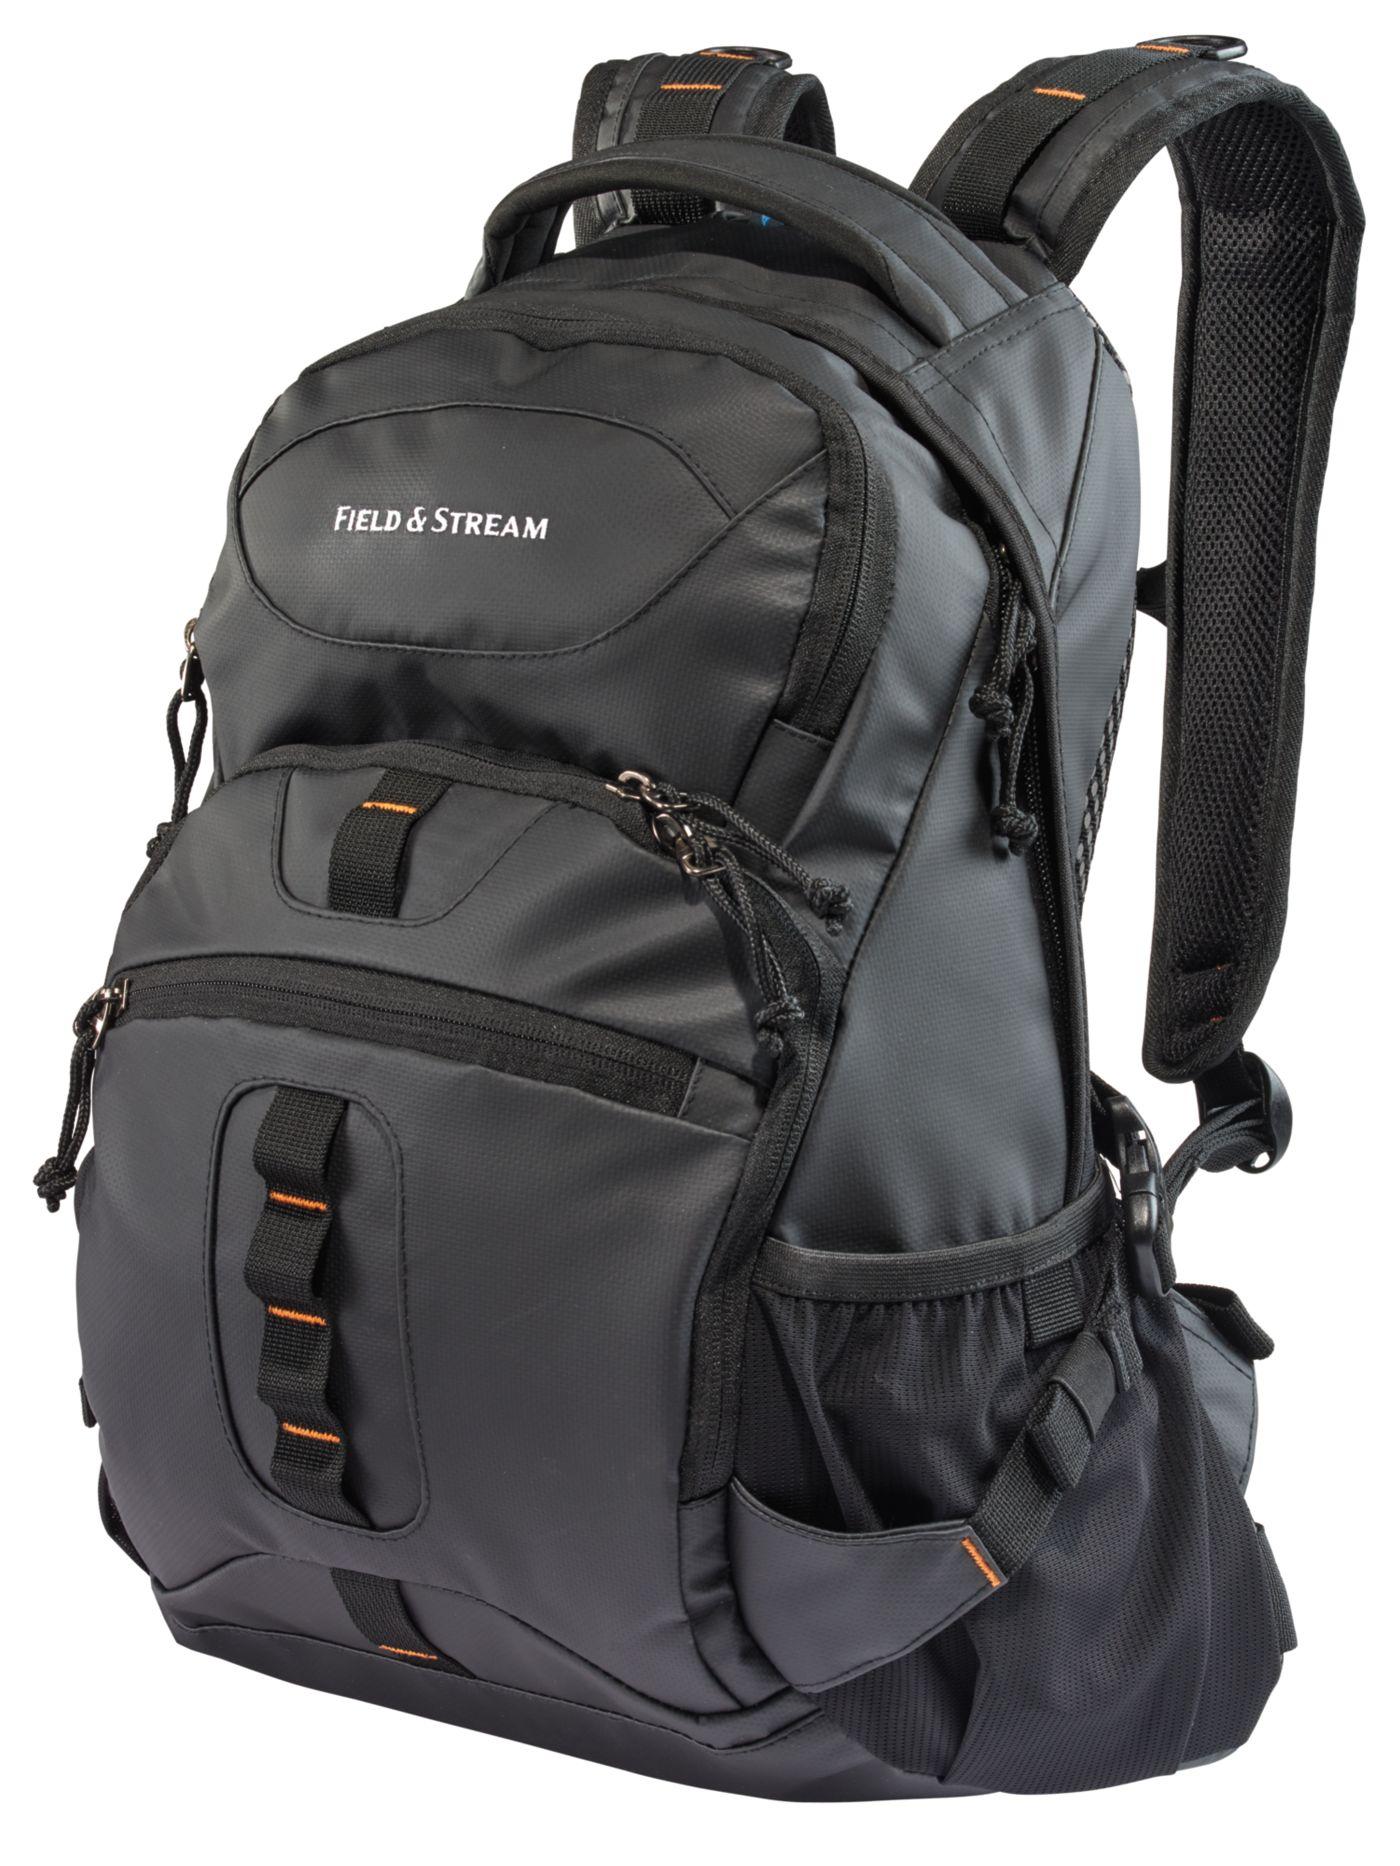 Field & Stream Tarpaulin Fabric Backpack